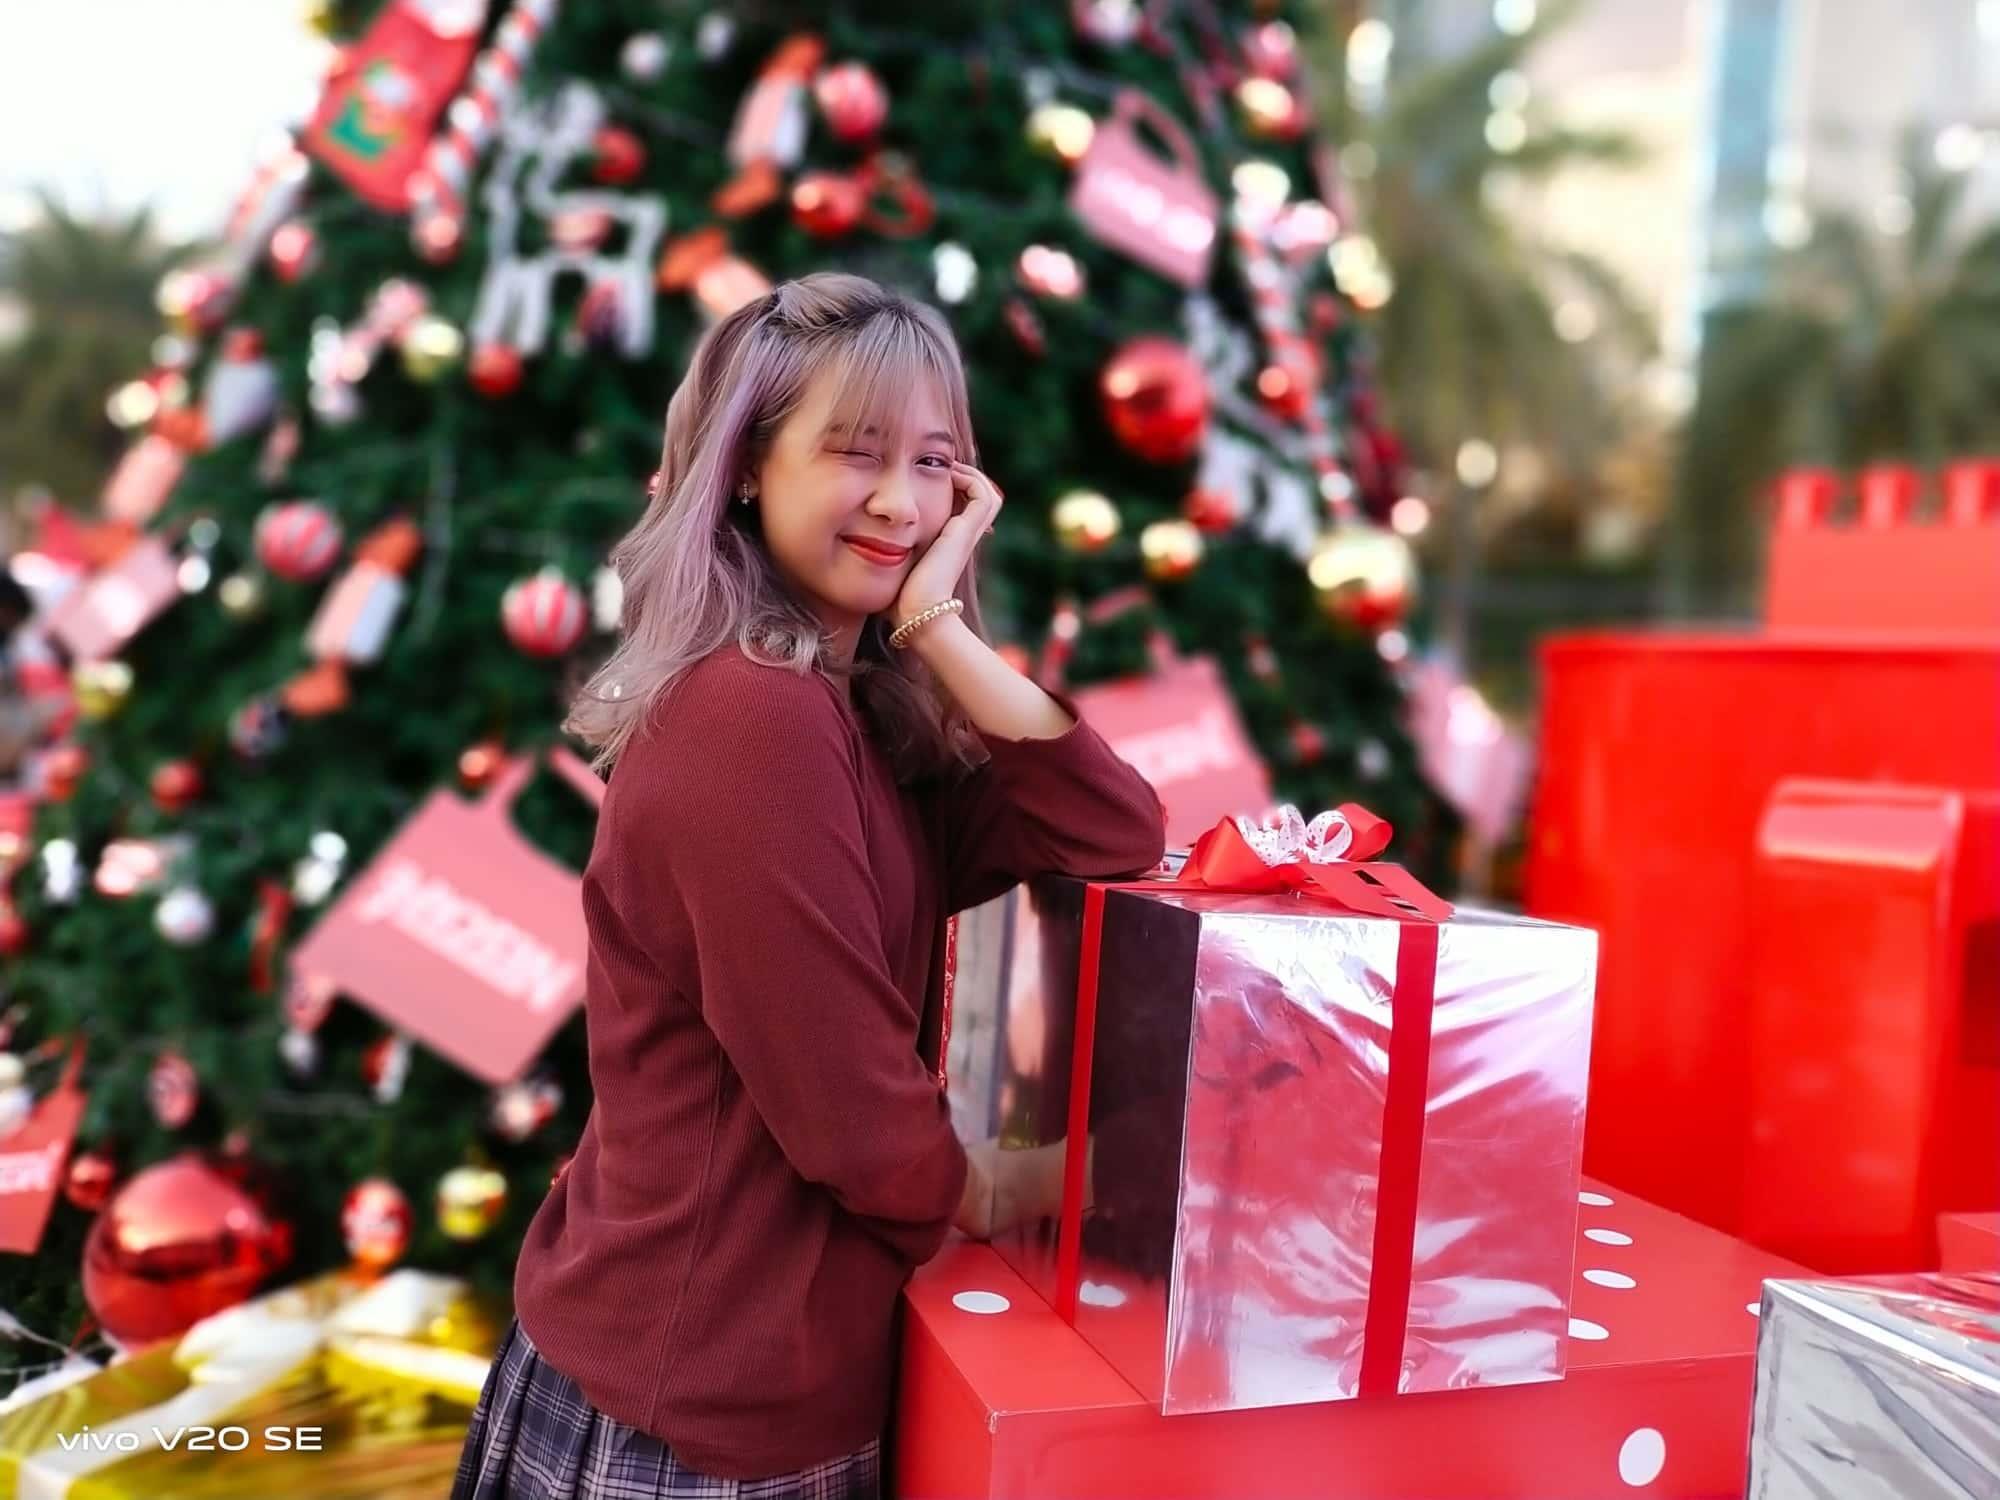 Vivo V20 SE - พก Vivo V20 SE ไปถ่ายรูปเล่นกับเทศกาลคริสต์มาส